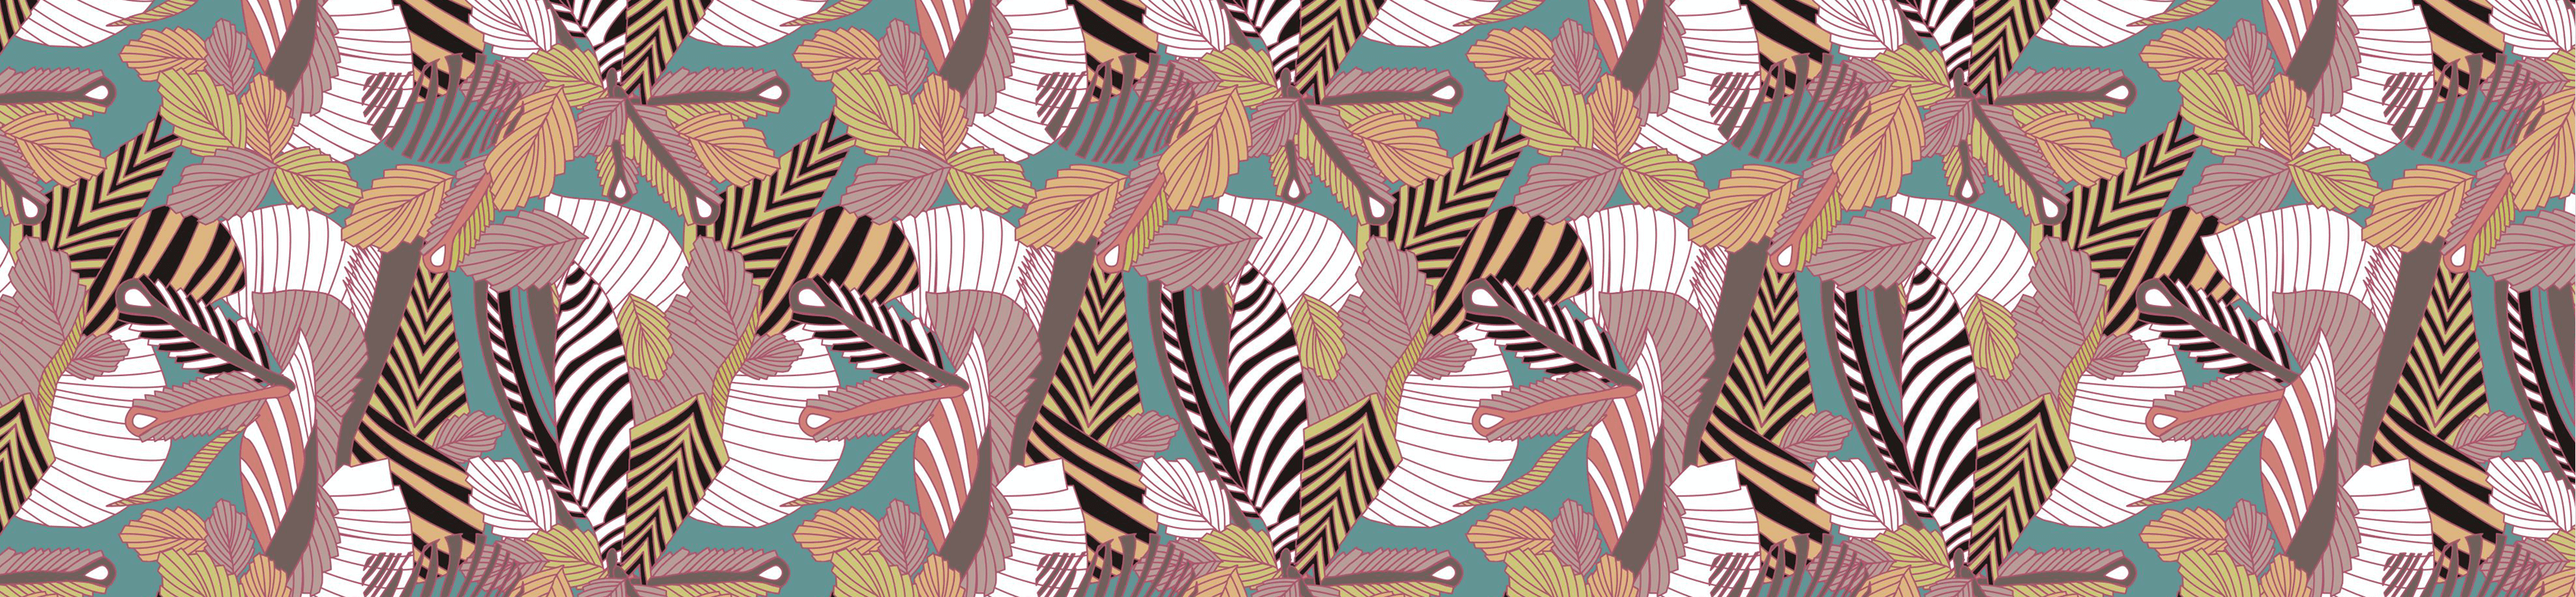 TropicalLush-pattern